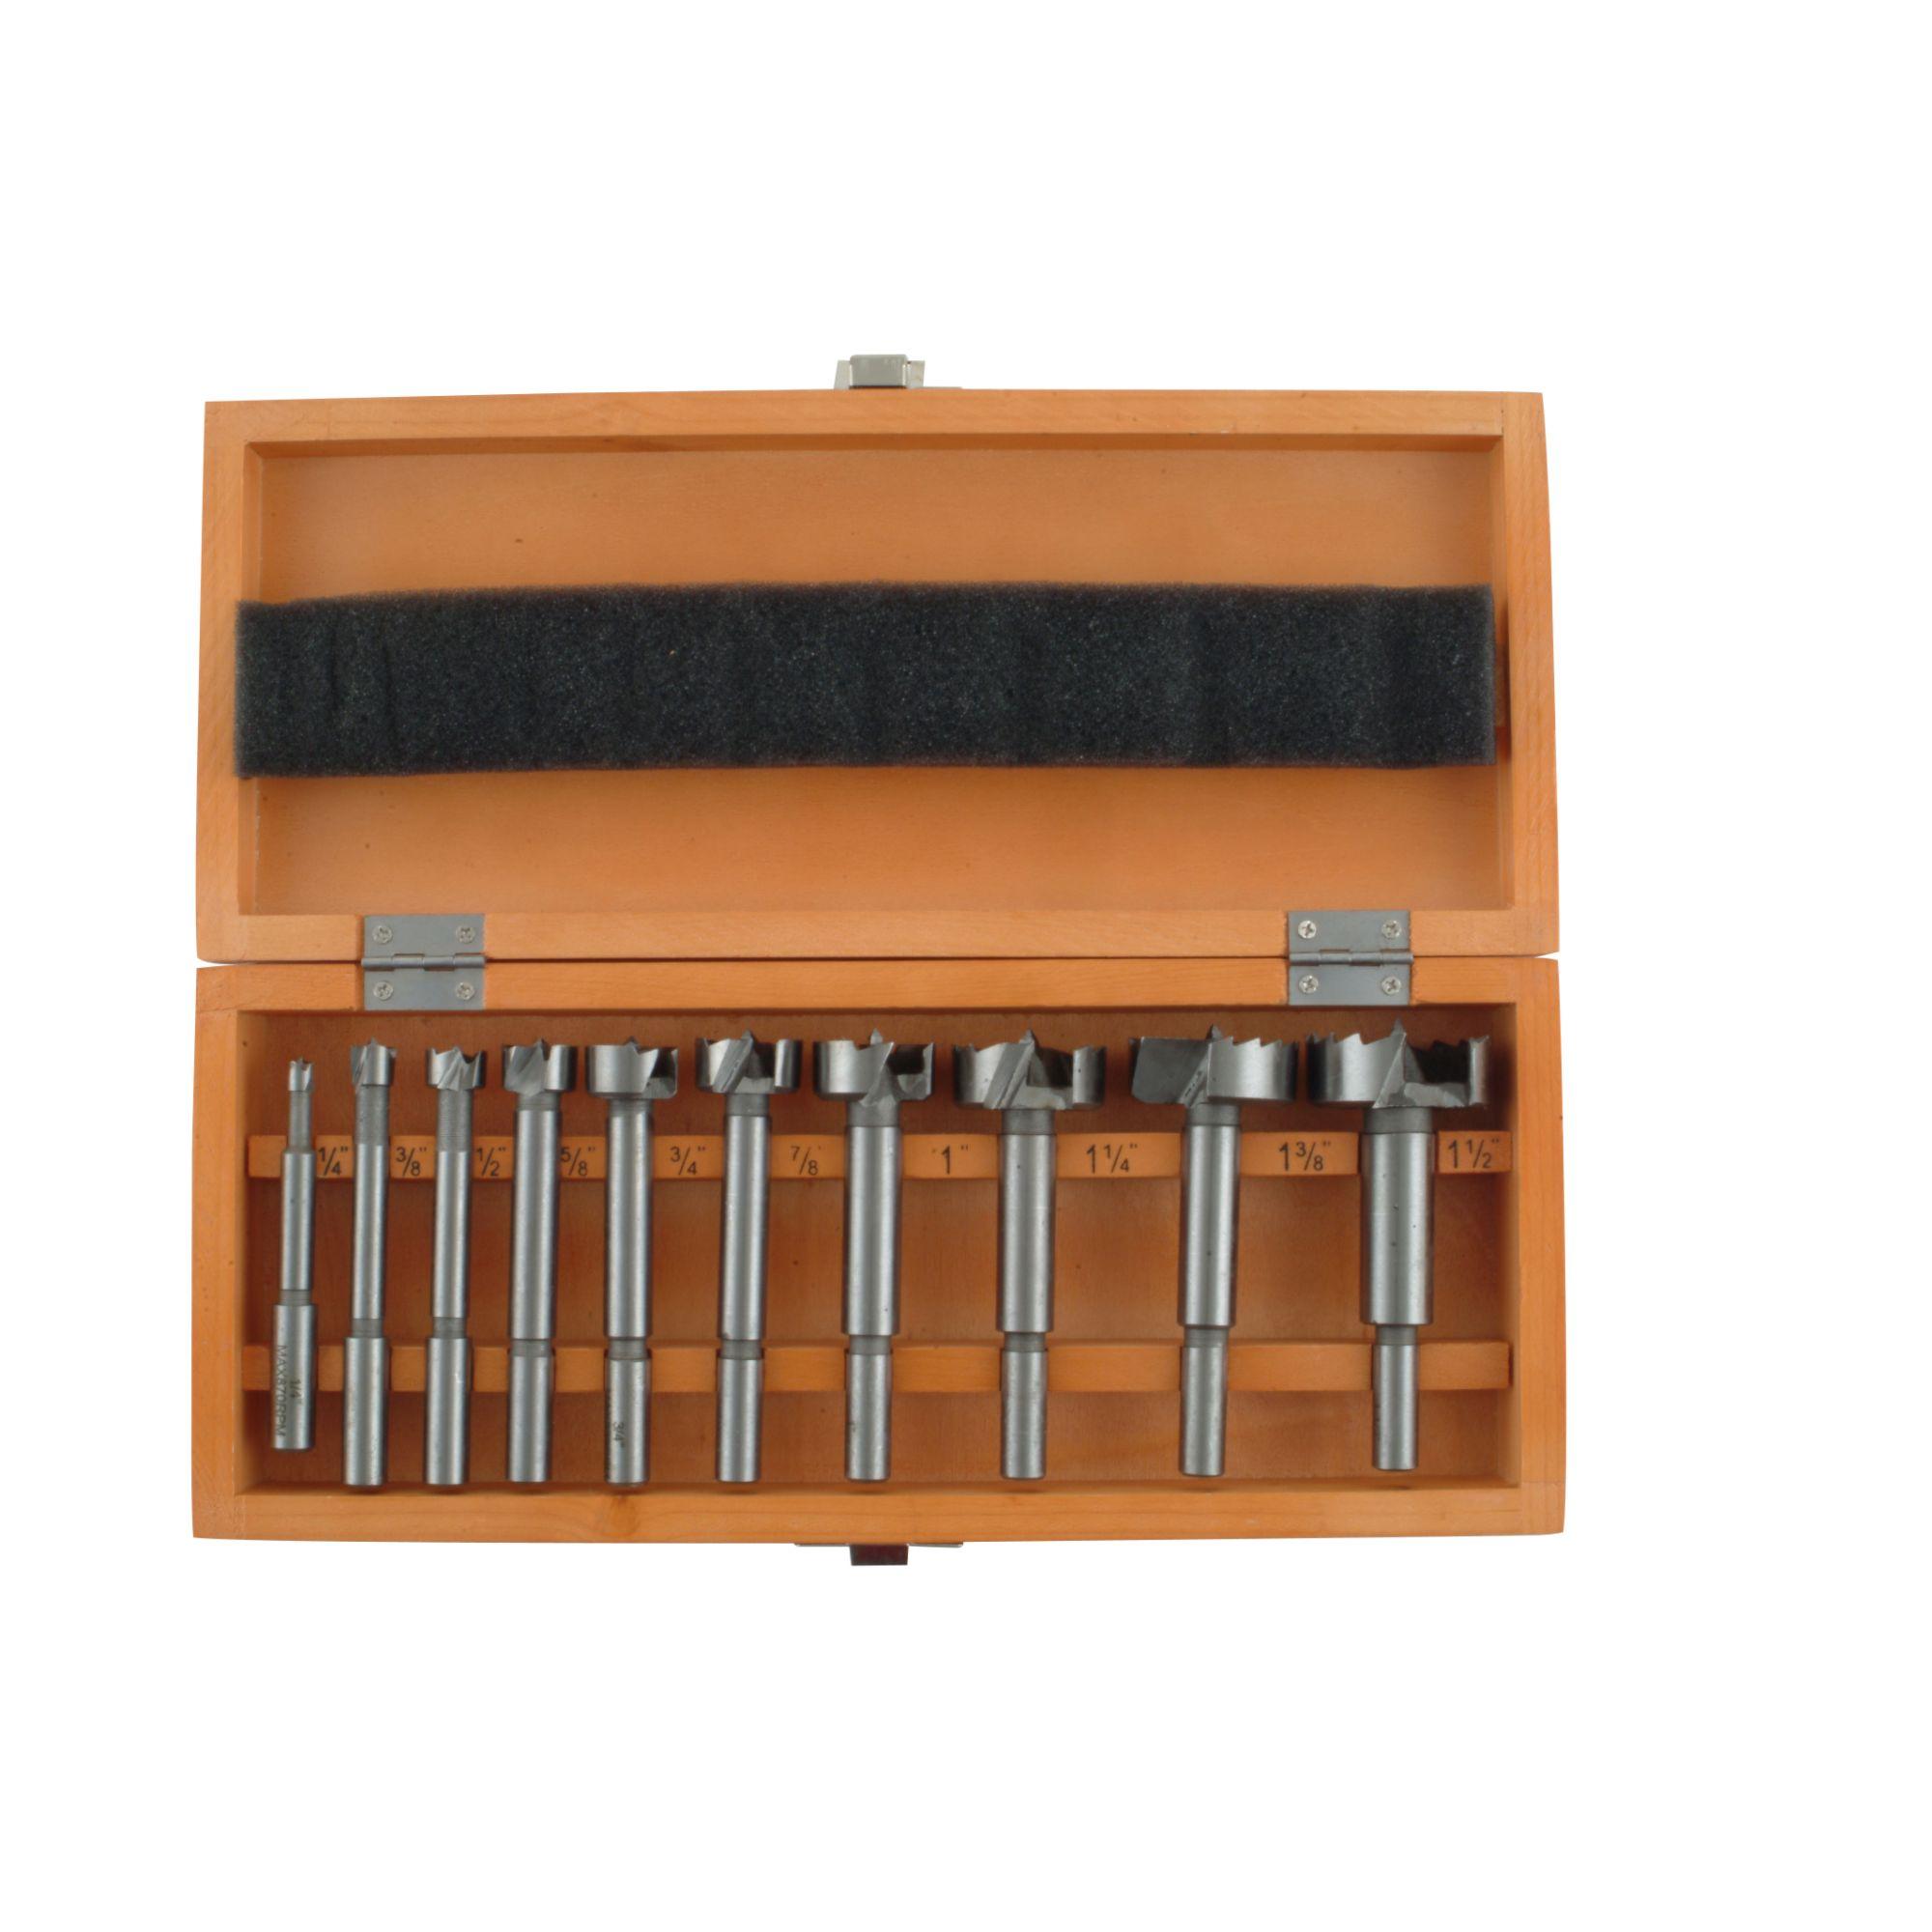 Skil 10 Pc. Forstner Bit Set with Wooden Storage Box